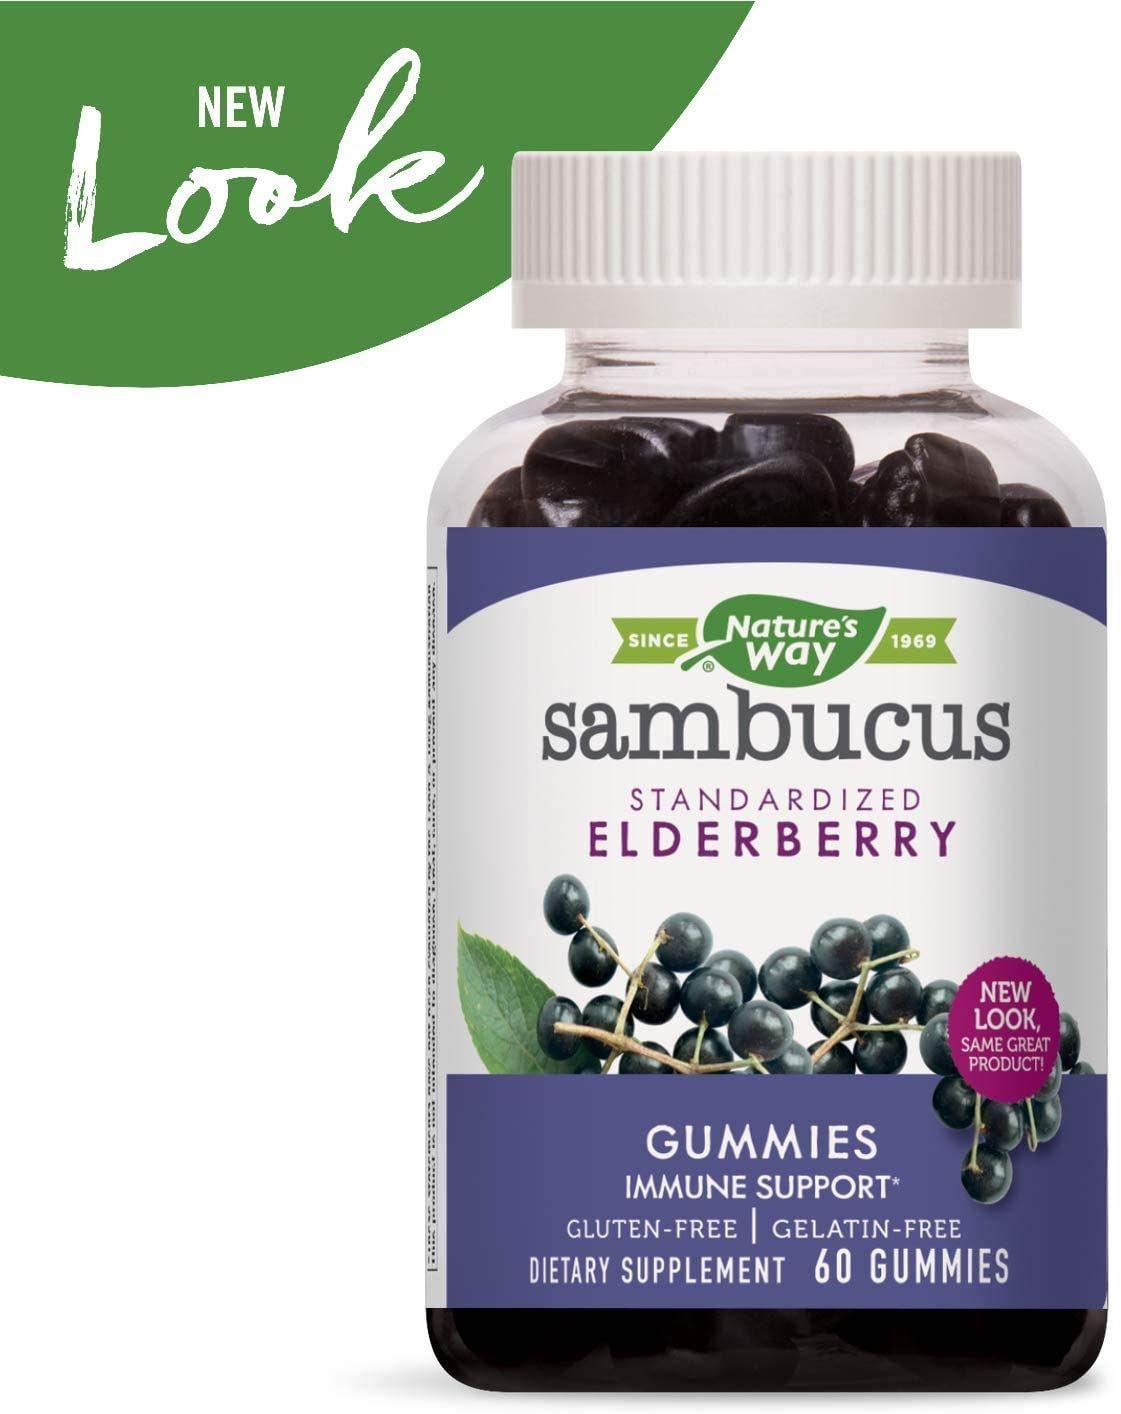 Nature's Way Sambucus Elderberry Gummies, herbal